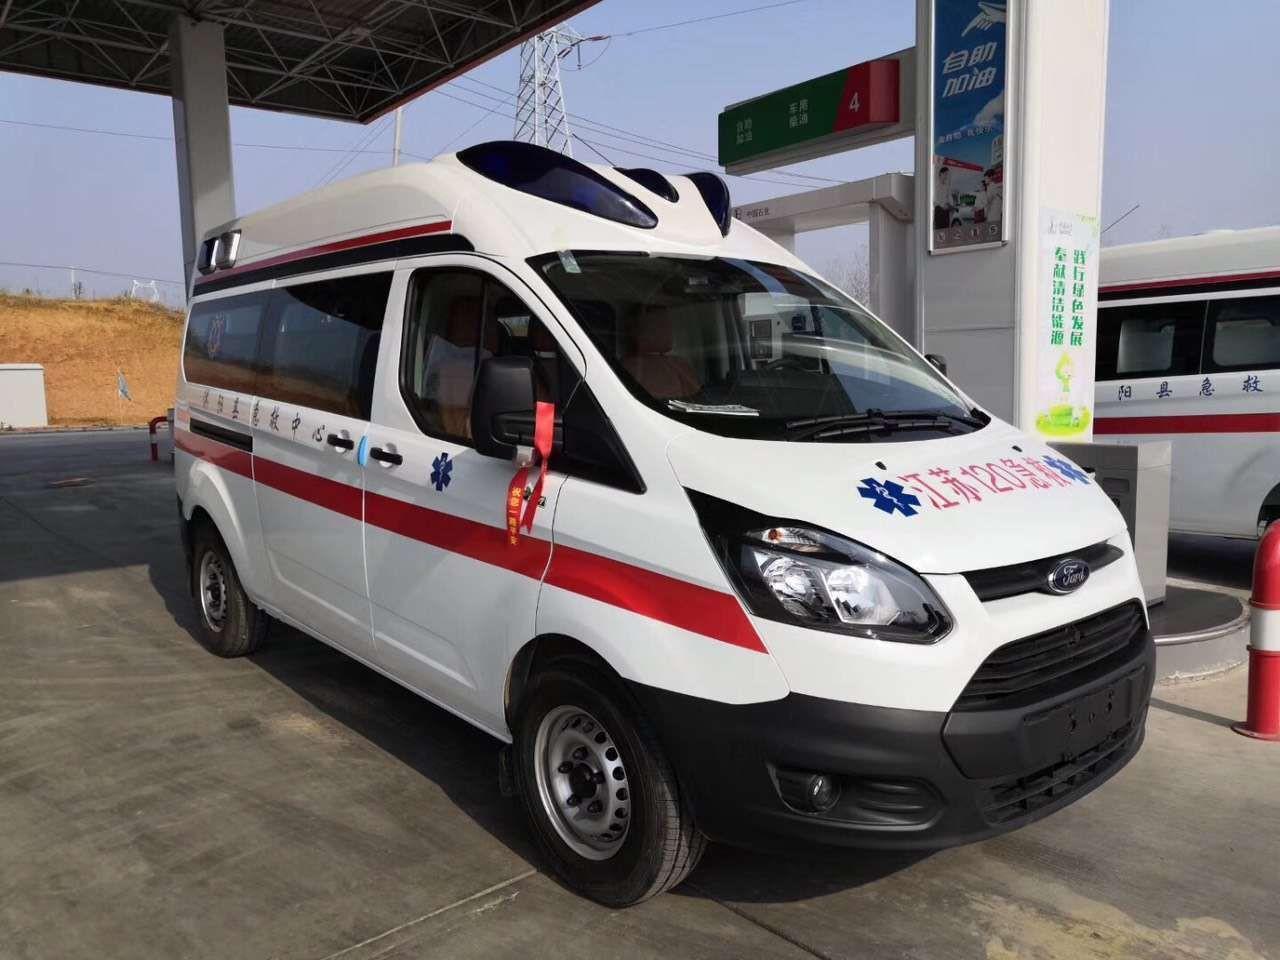 Ford V348 high roof ambulance car price